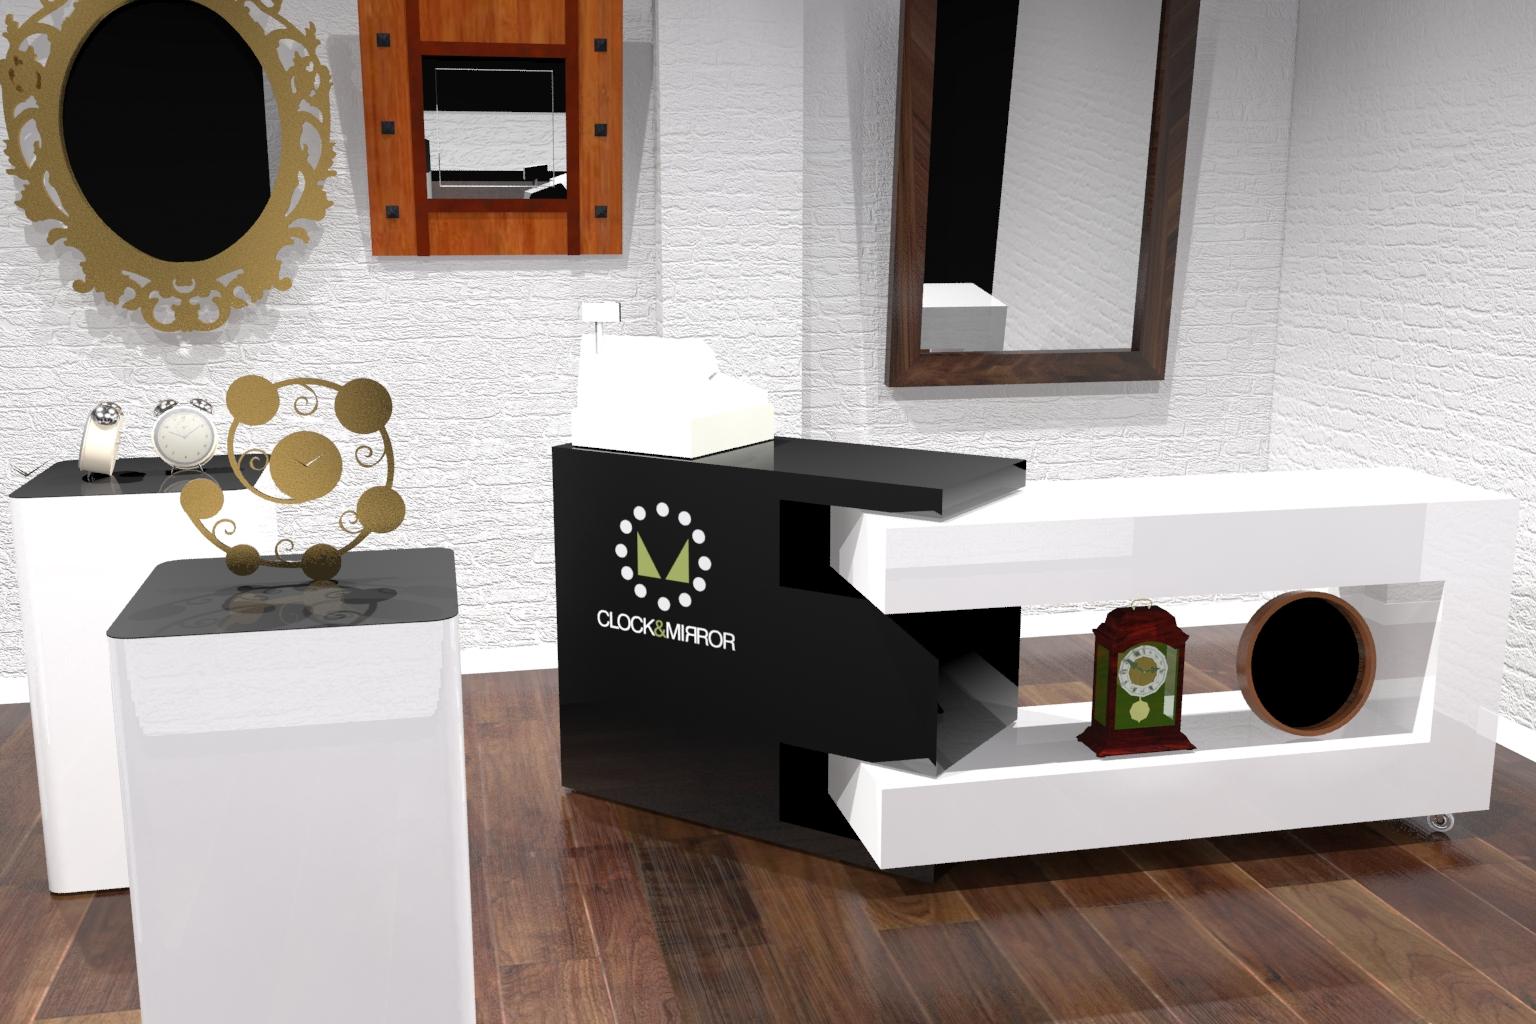 Sports frame counter+plinths